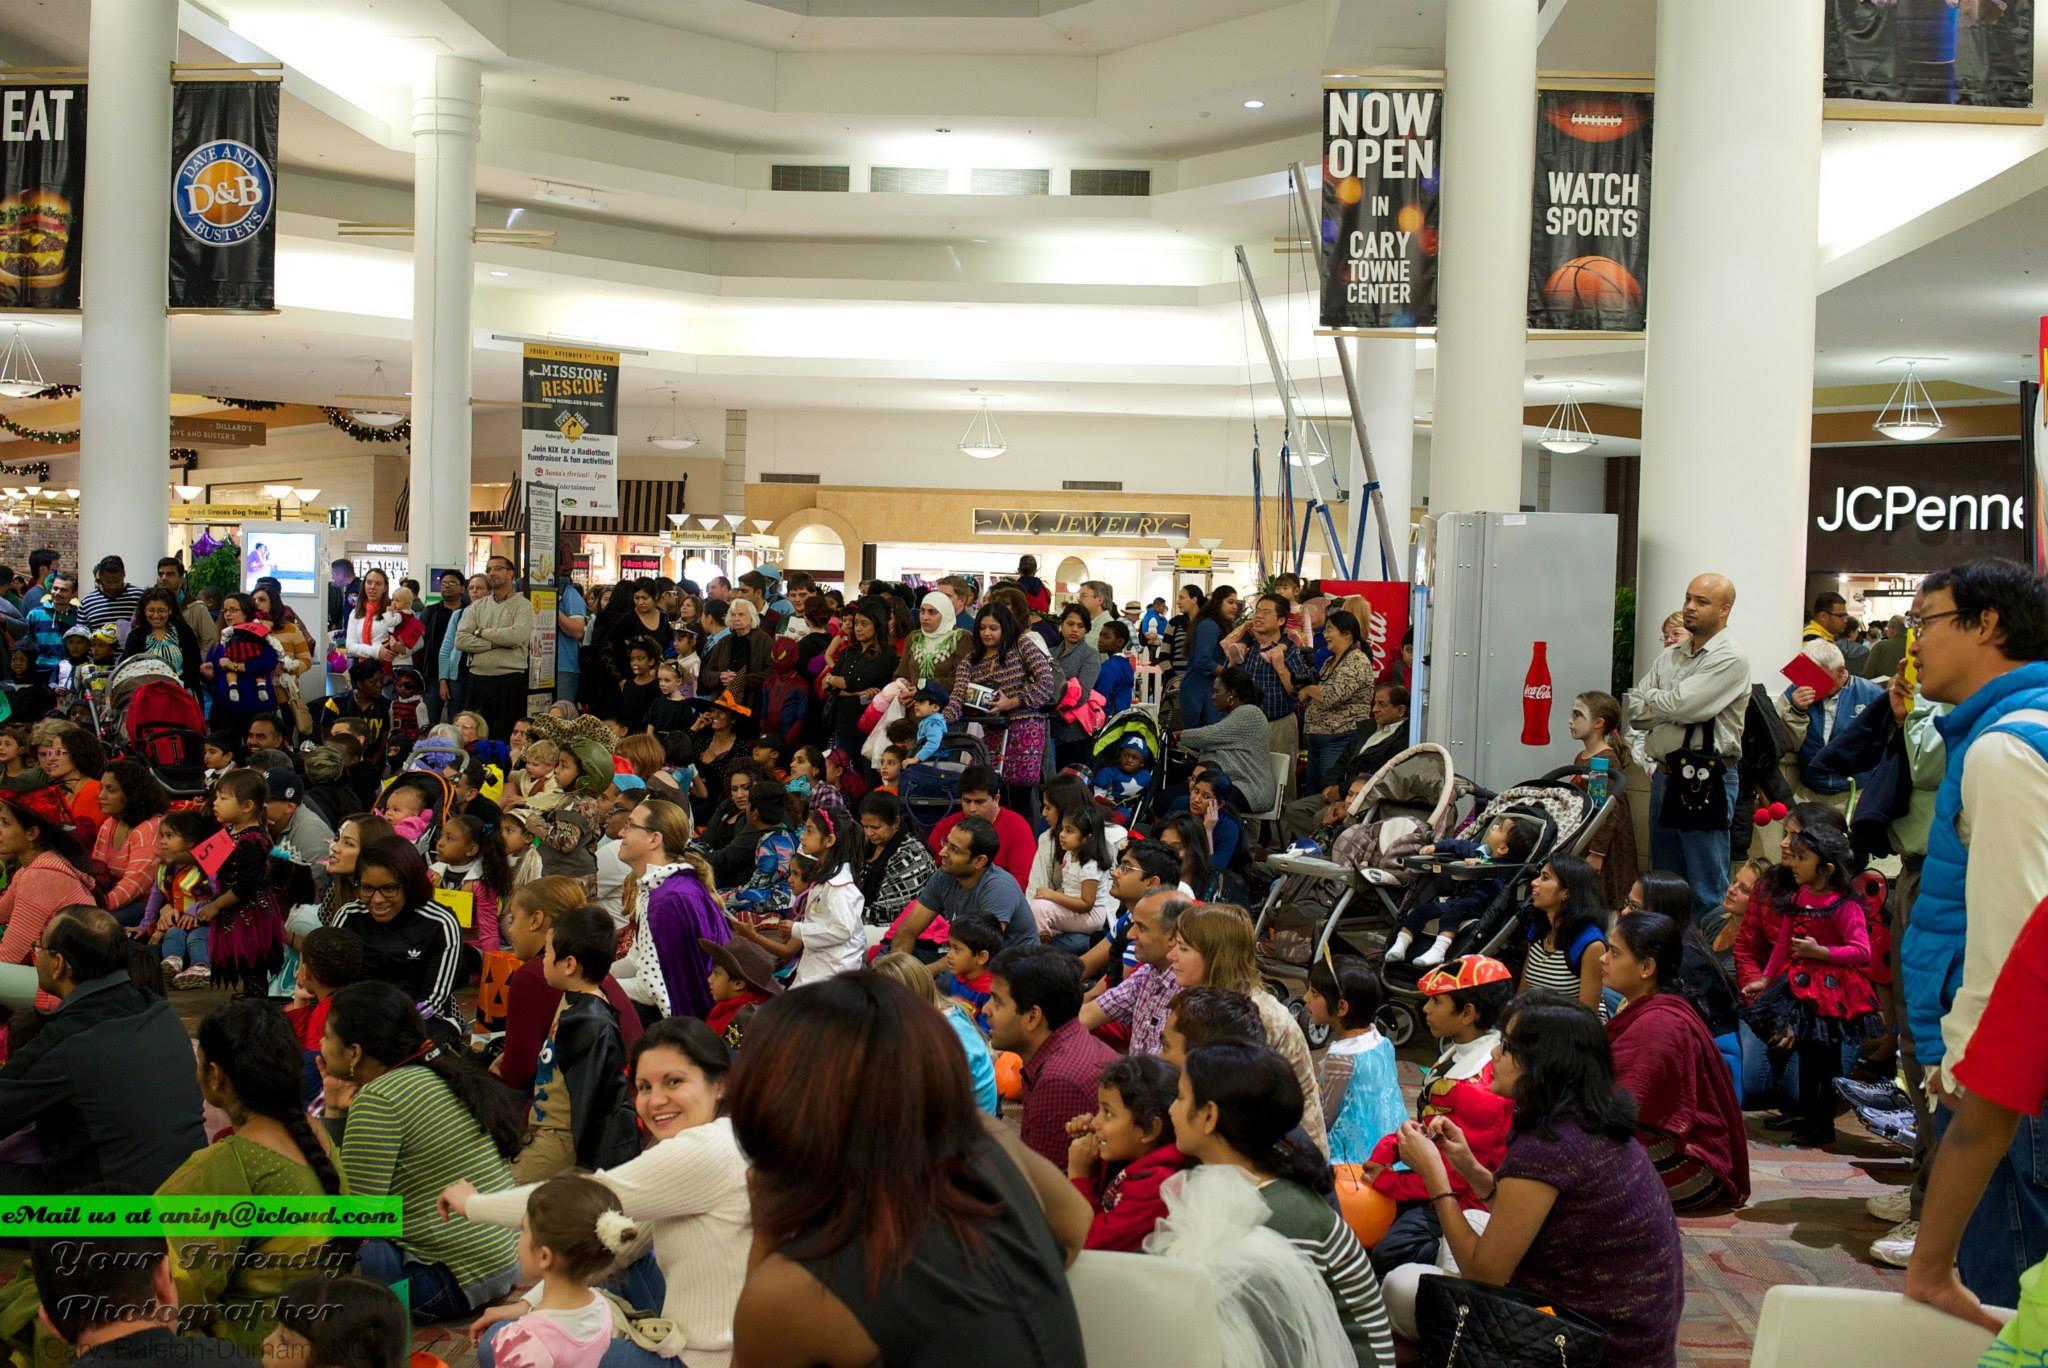 Thronging-crowd-3